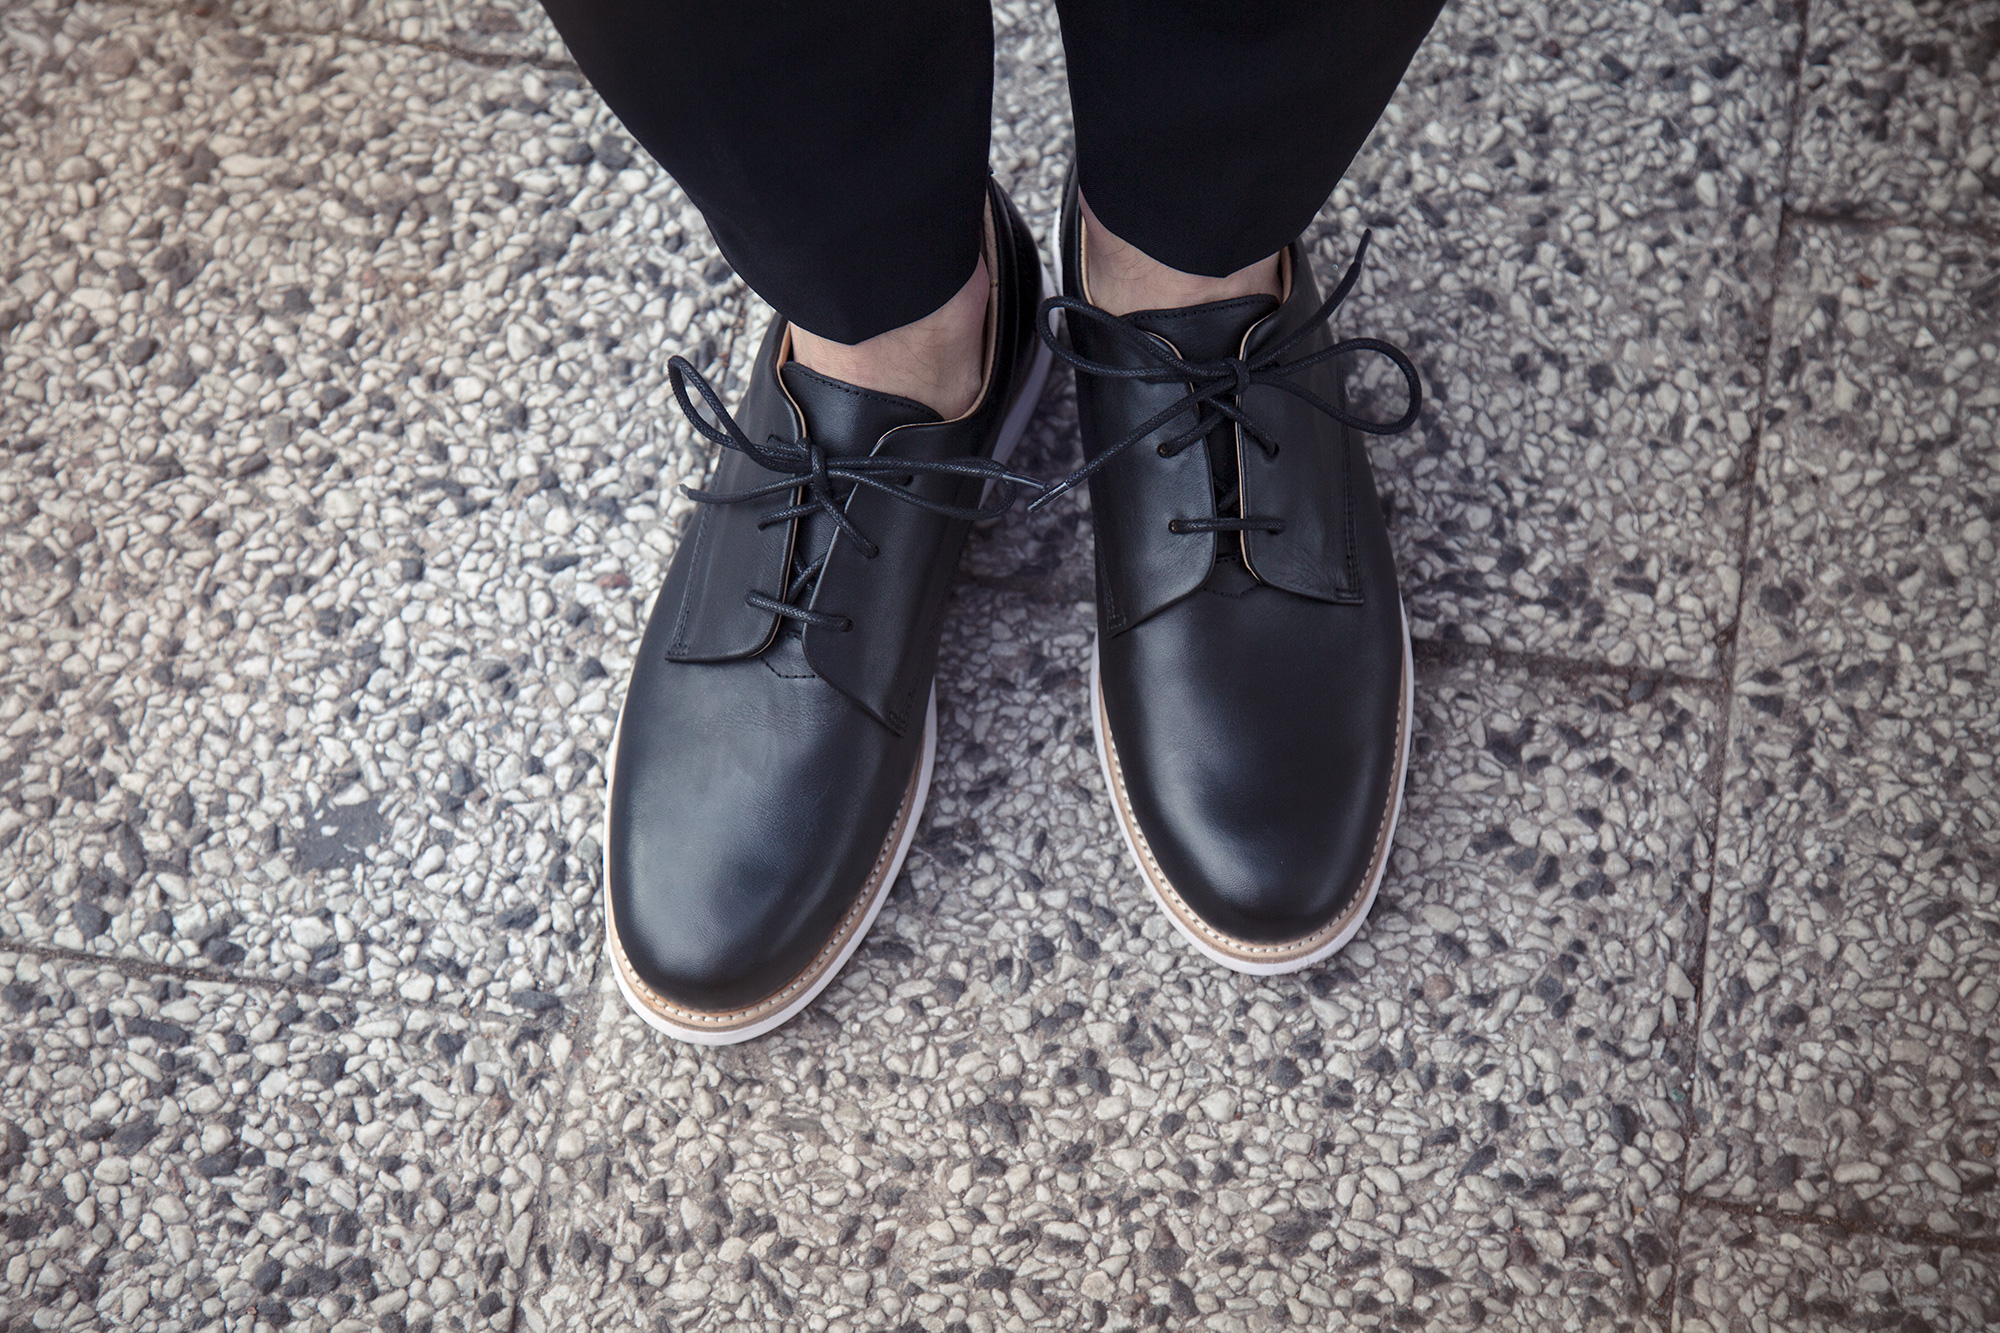 Gram Shoes SS16